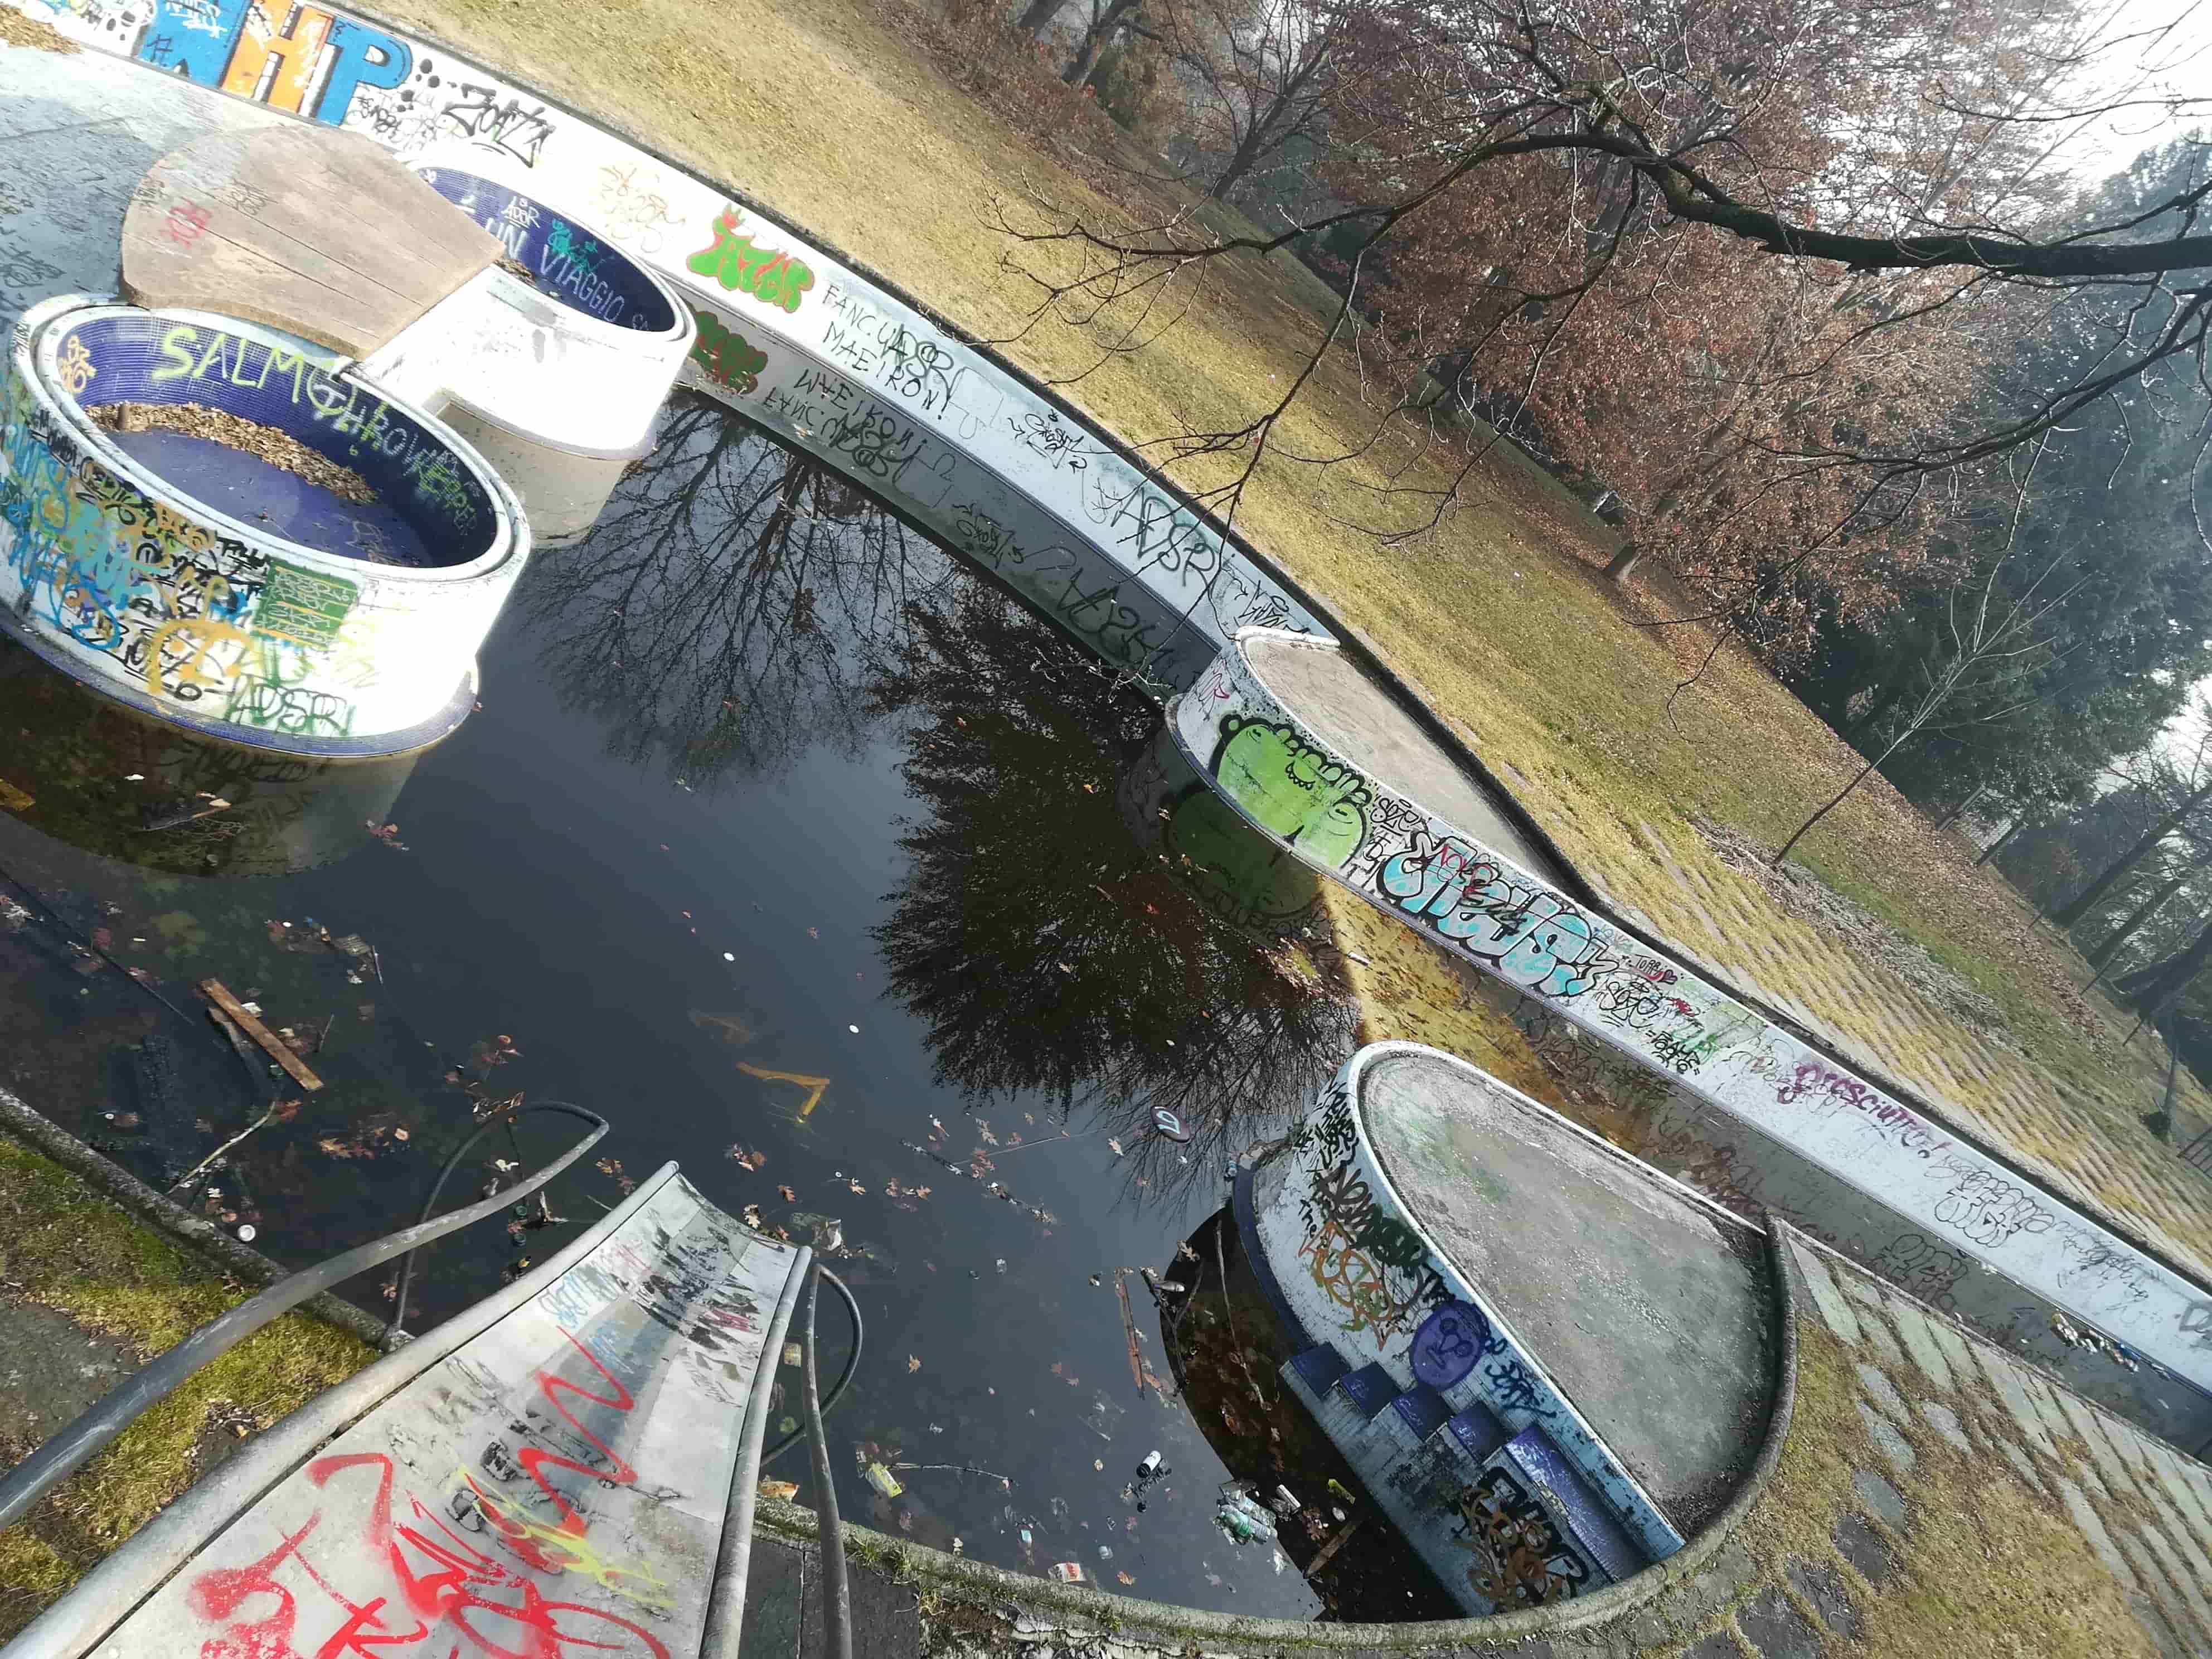 La piscina di Pietro Porcinai